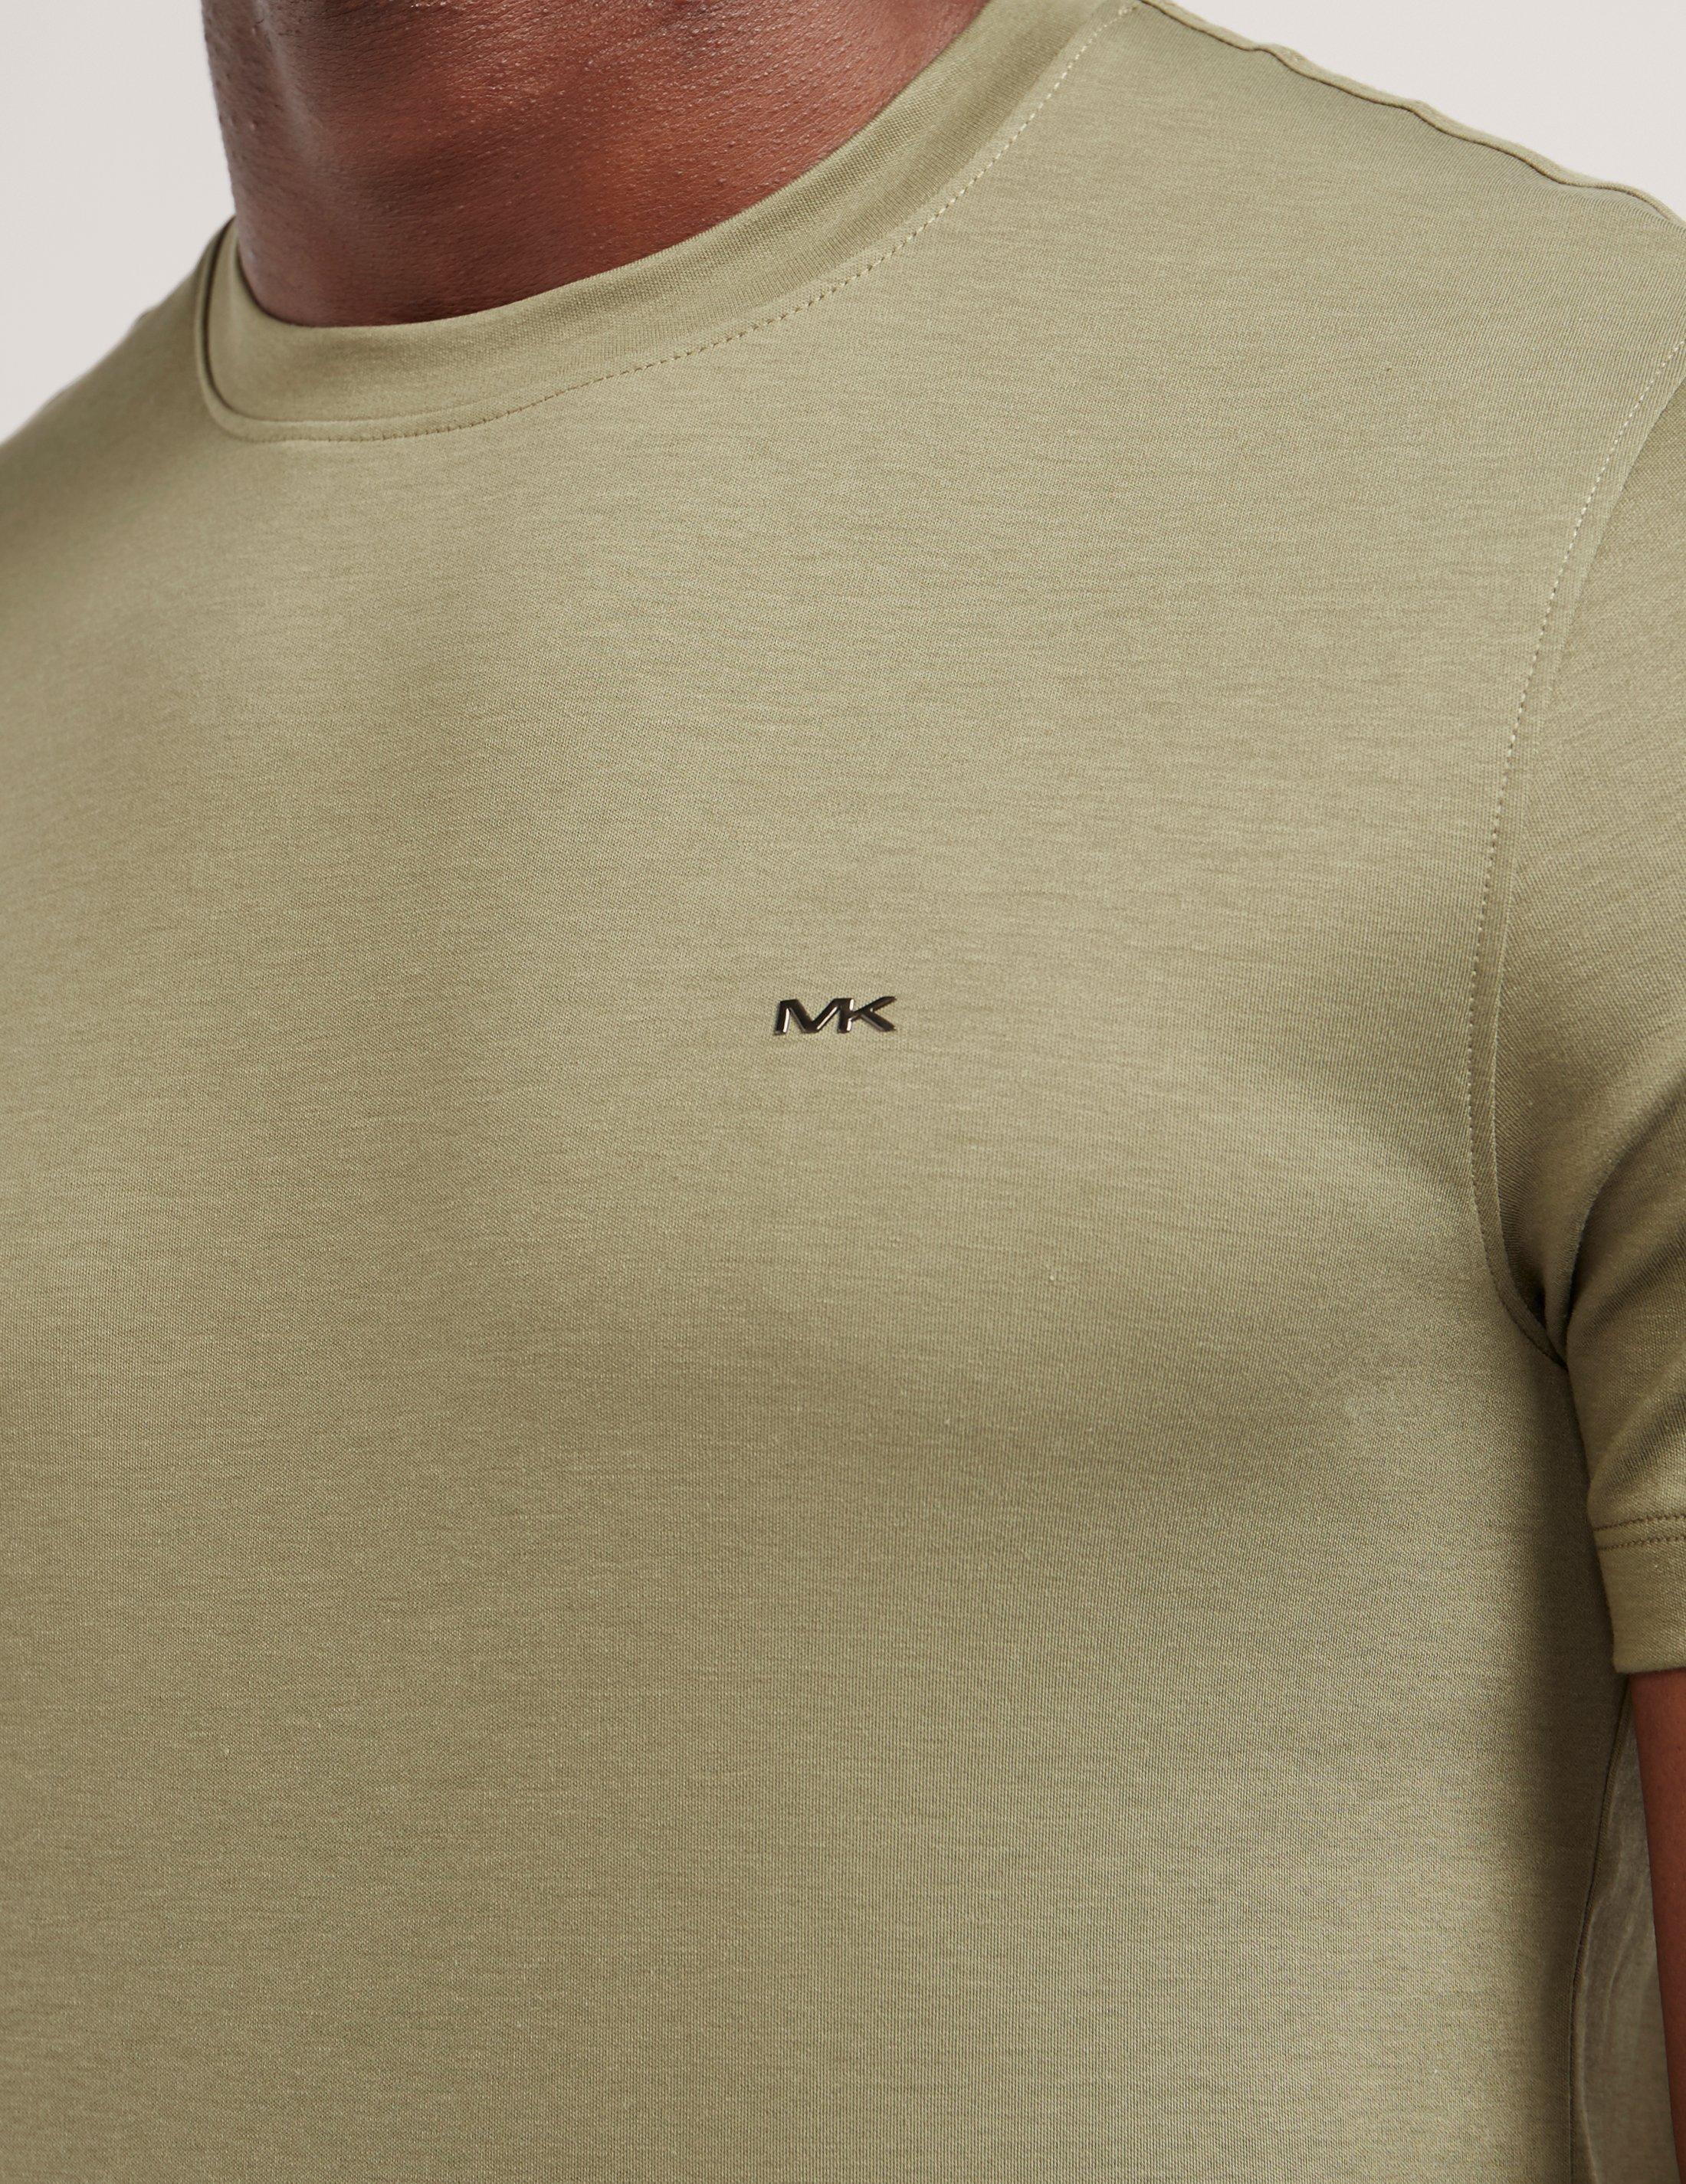 663ca9f9 Lyst - Michael Kors Short Sleeve Sleek T-shirt for Men